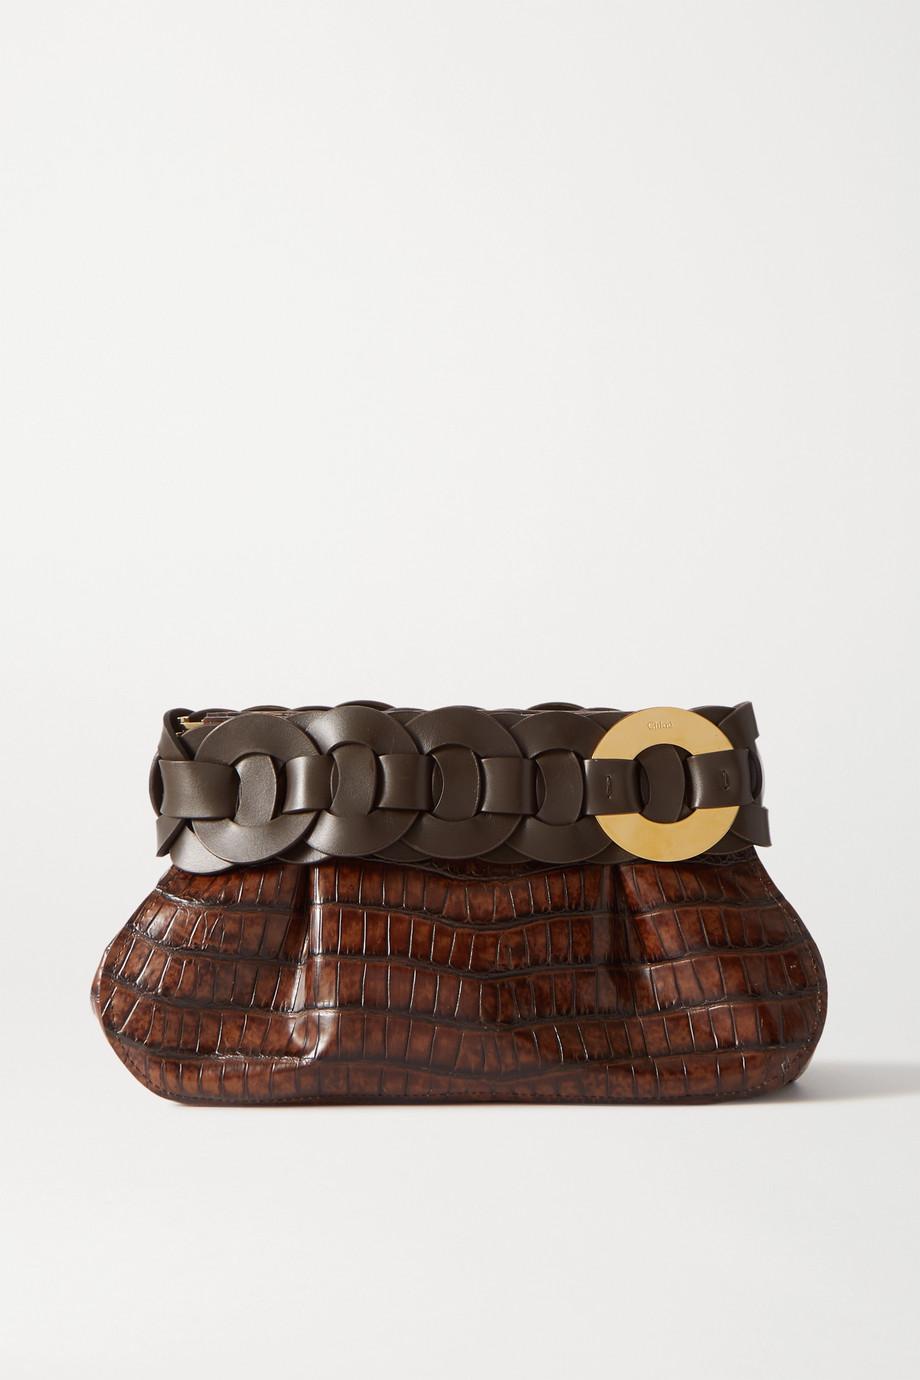 Chloé Darryl Clutch aus Leder mit Krokodileffekt und Flechtdetail